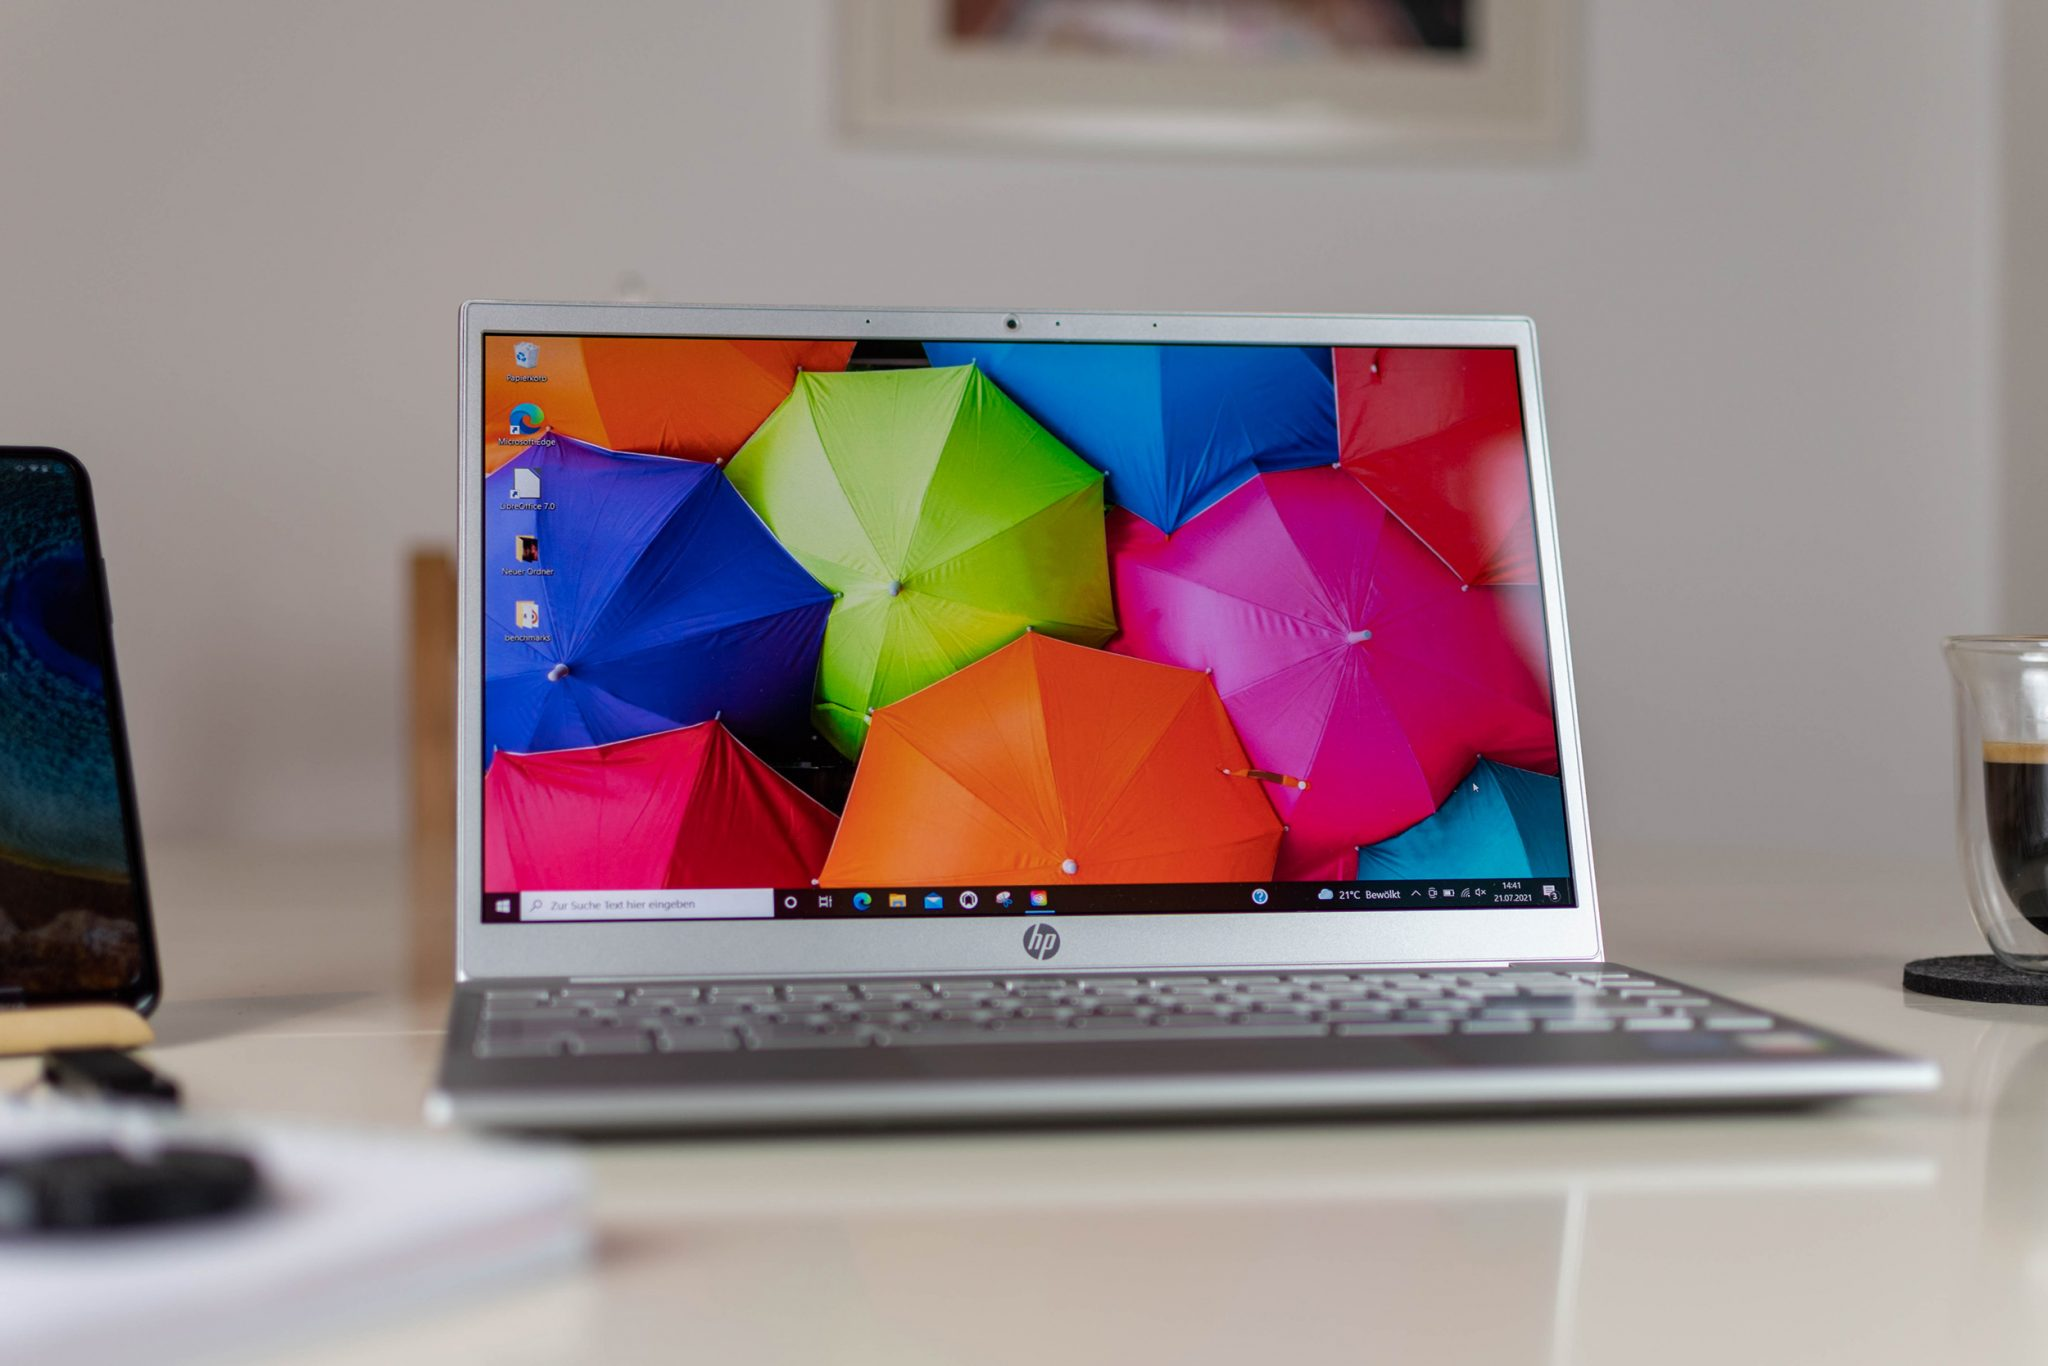 HP Pavilion 13 im Test - kompaktes Allround-Notebook (1)